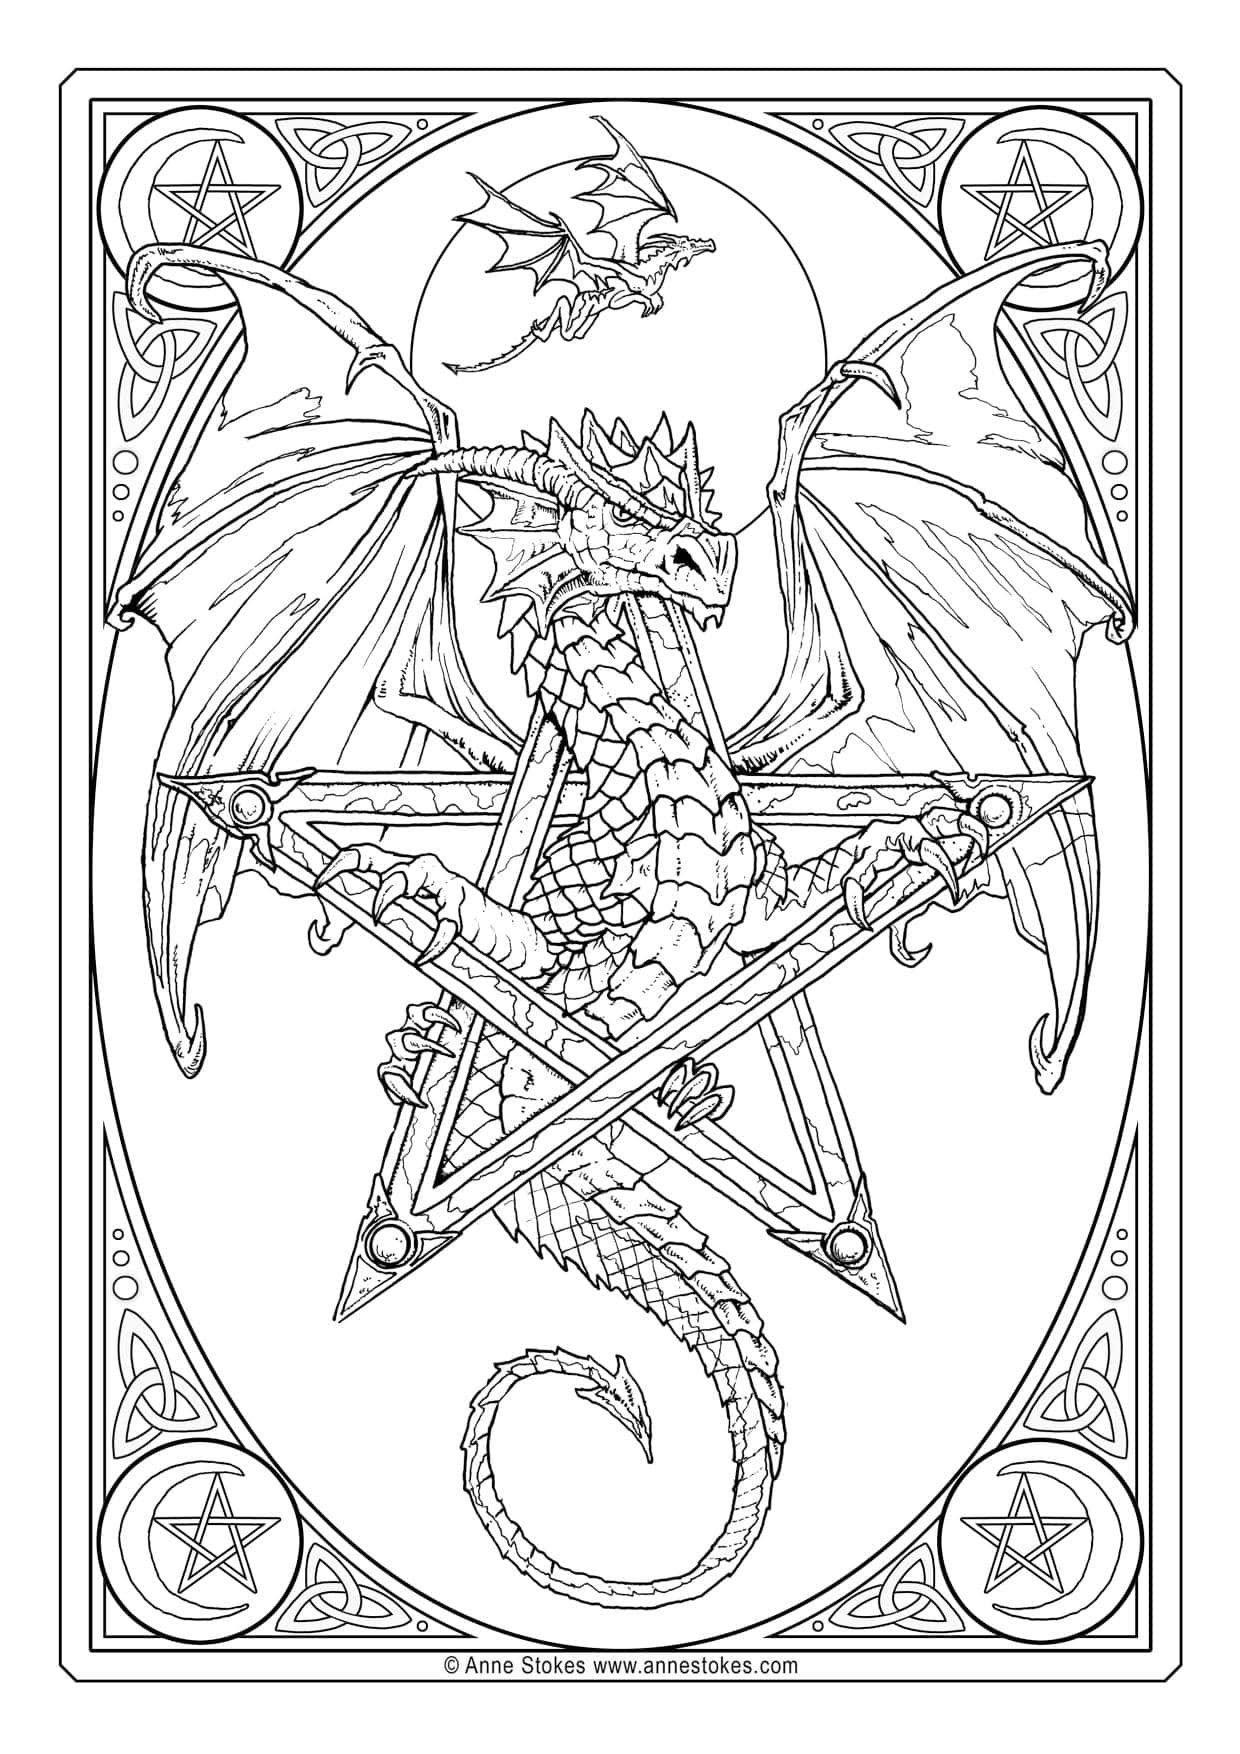 Pin By Irma Kok On Kleurplaten Anne Stokes Art Cards Anne Stokes